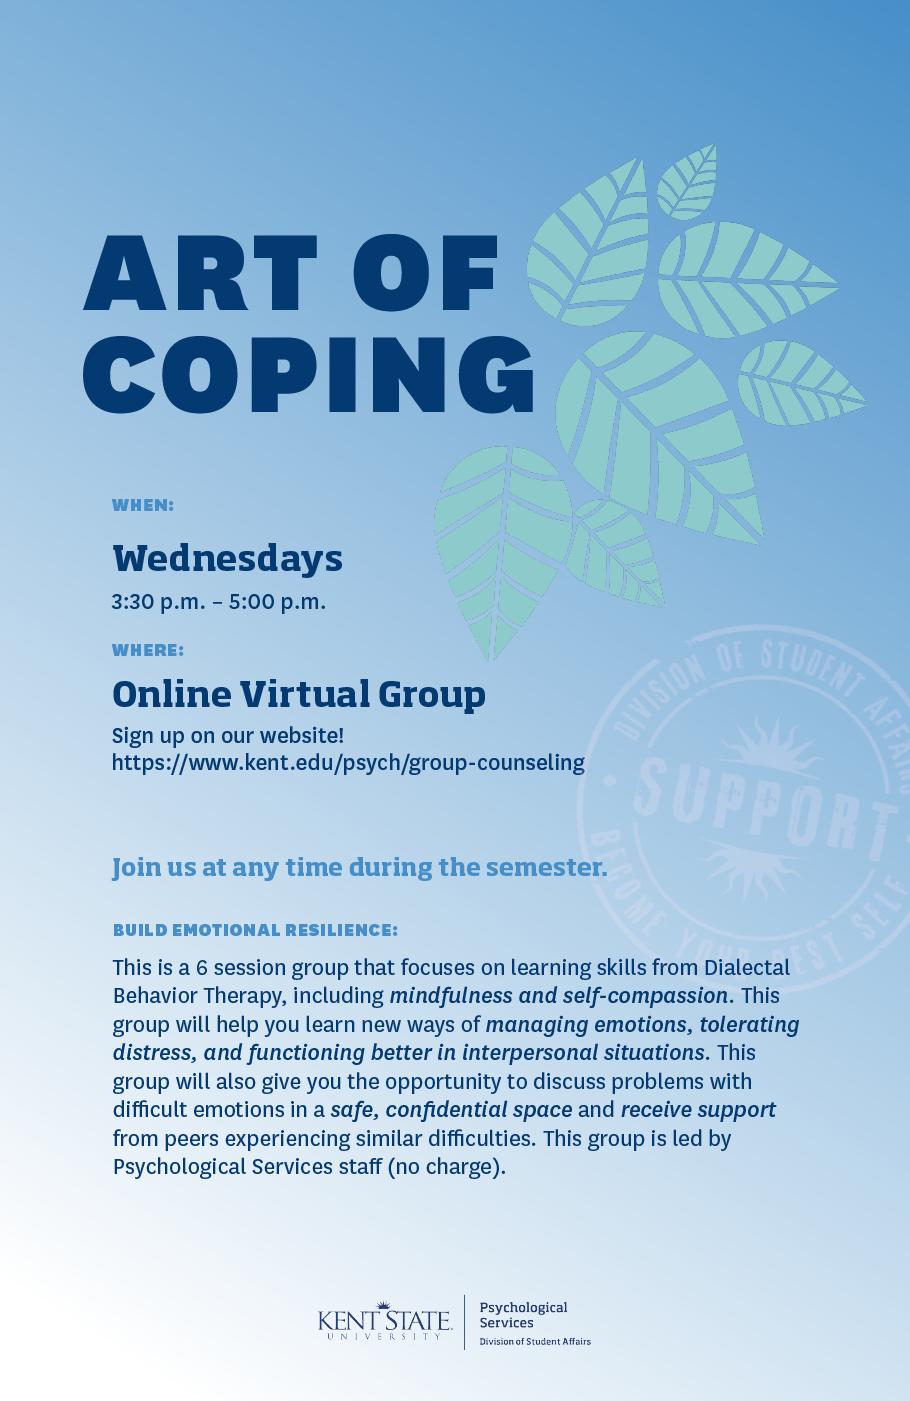 Art of Coping